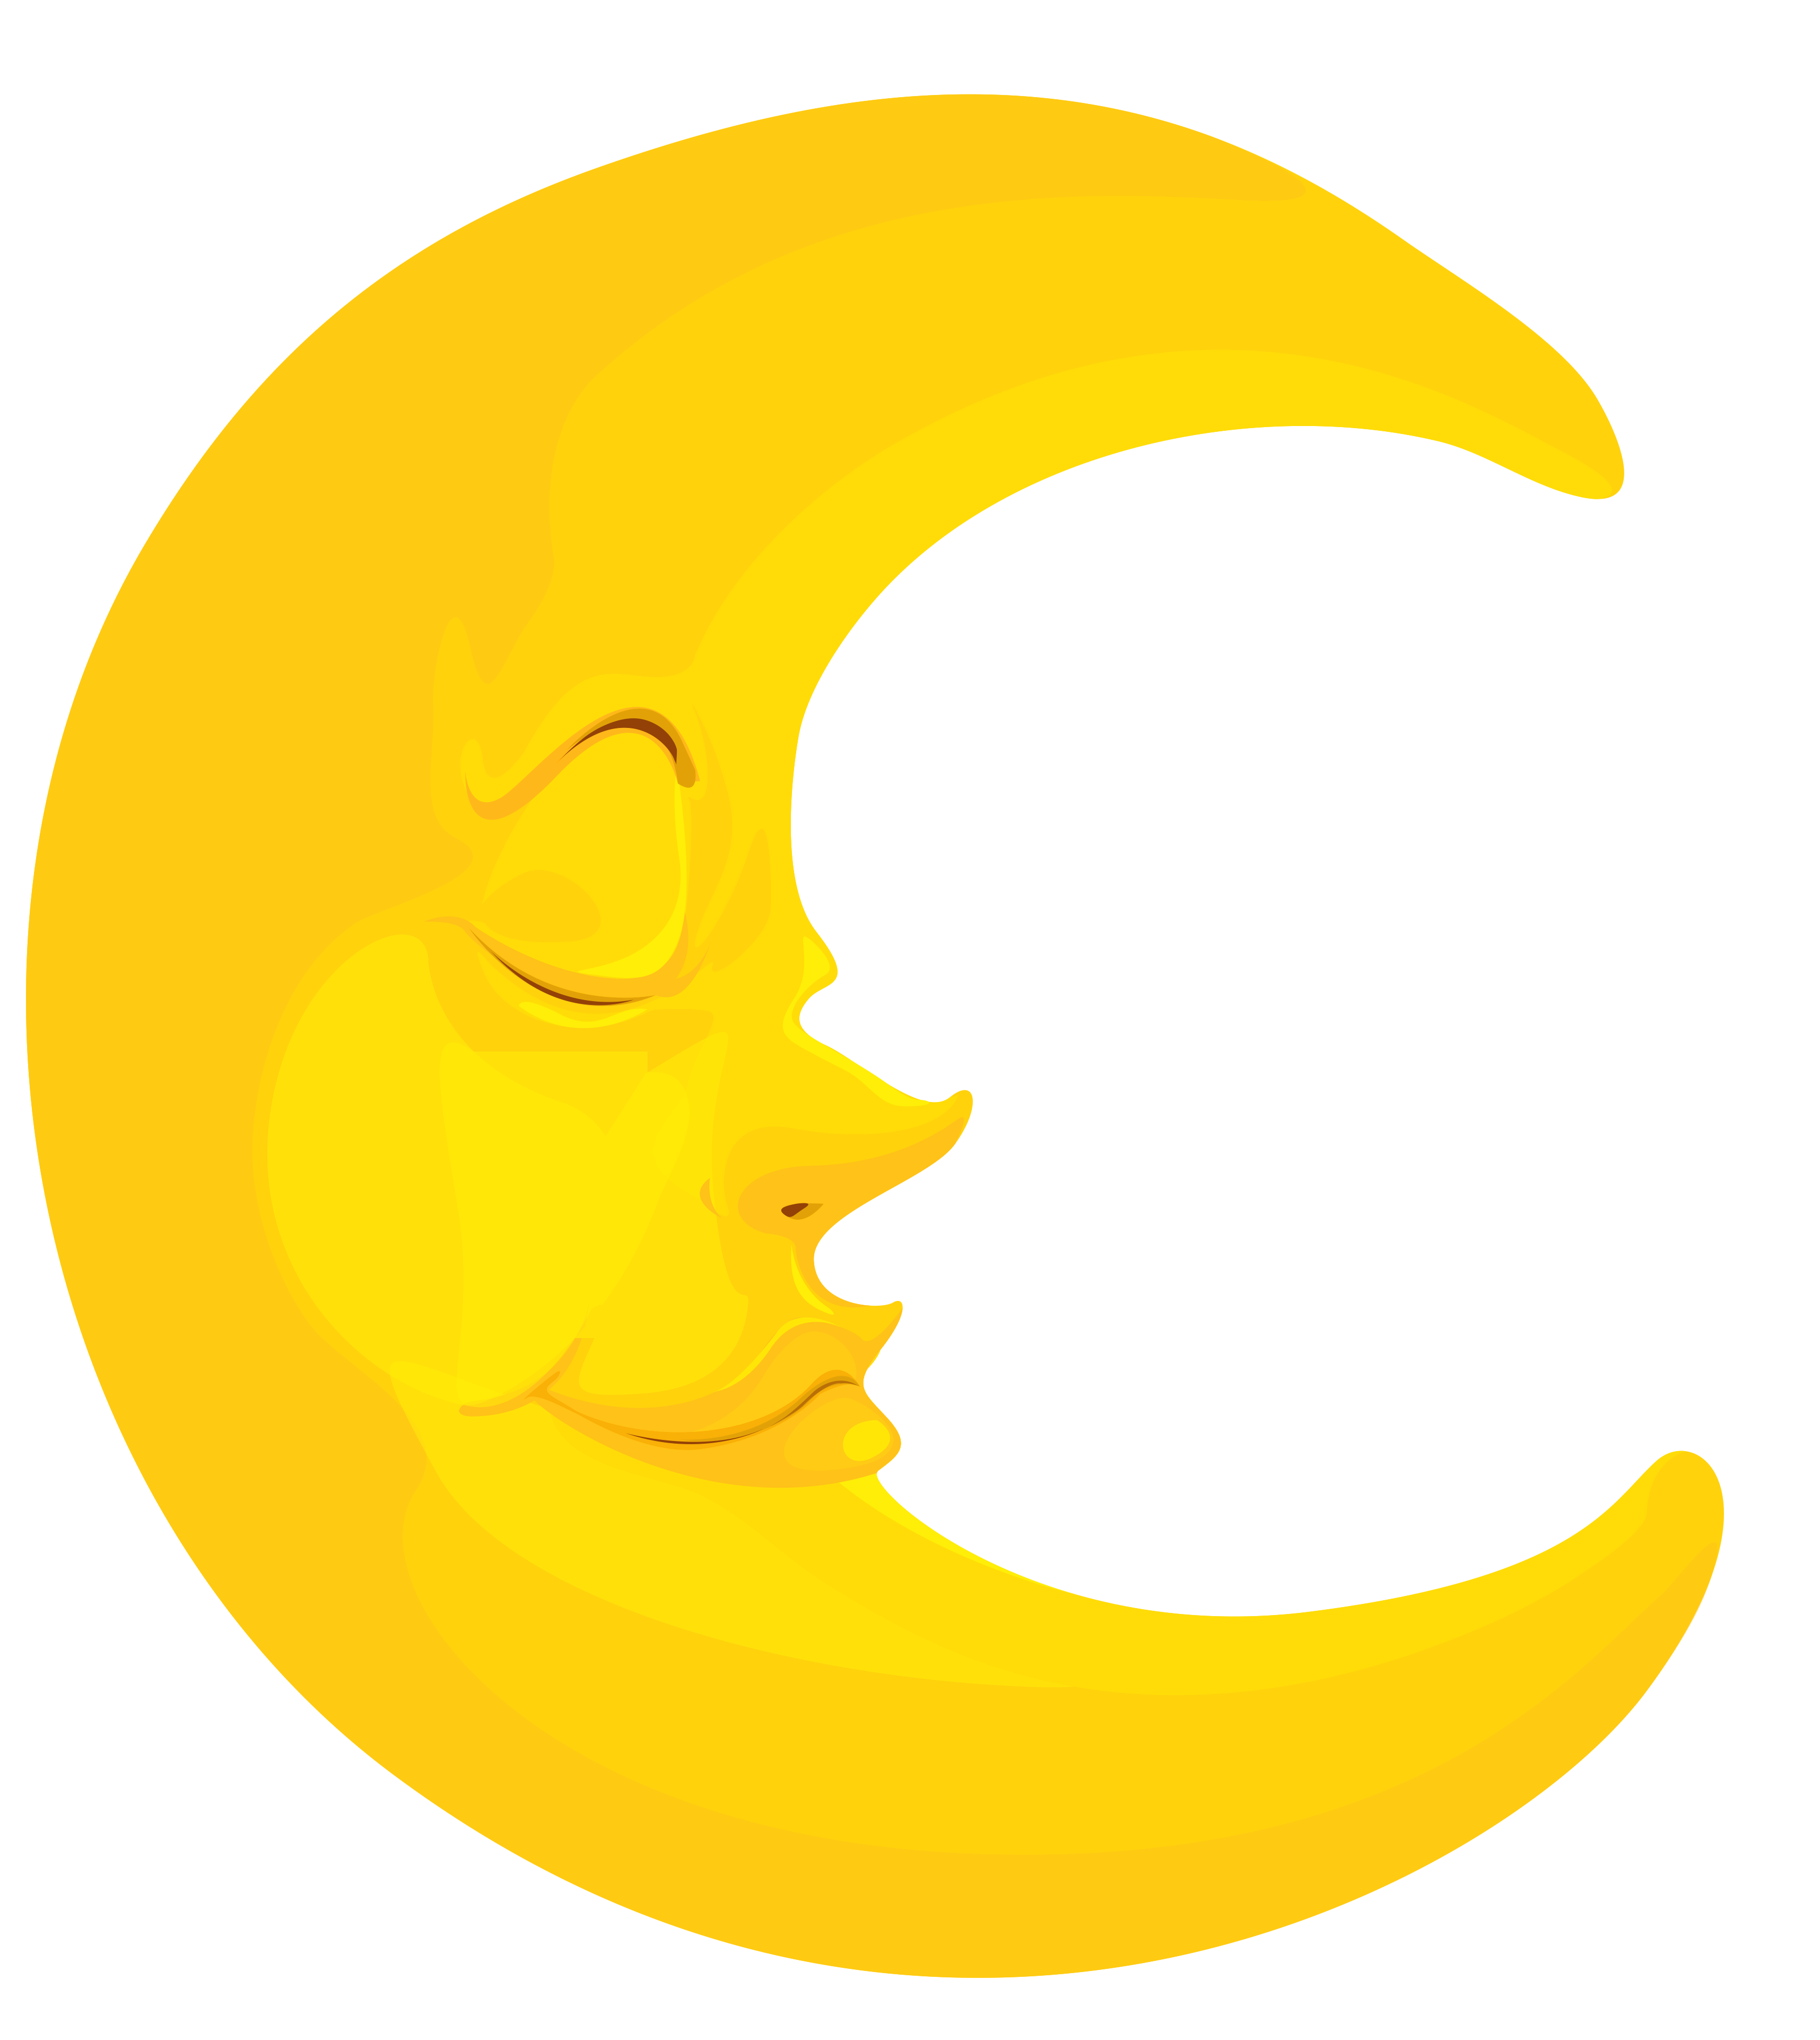 moon clipart u0026middot; moo - Moon Clip Art